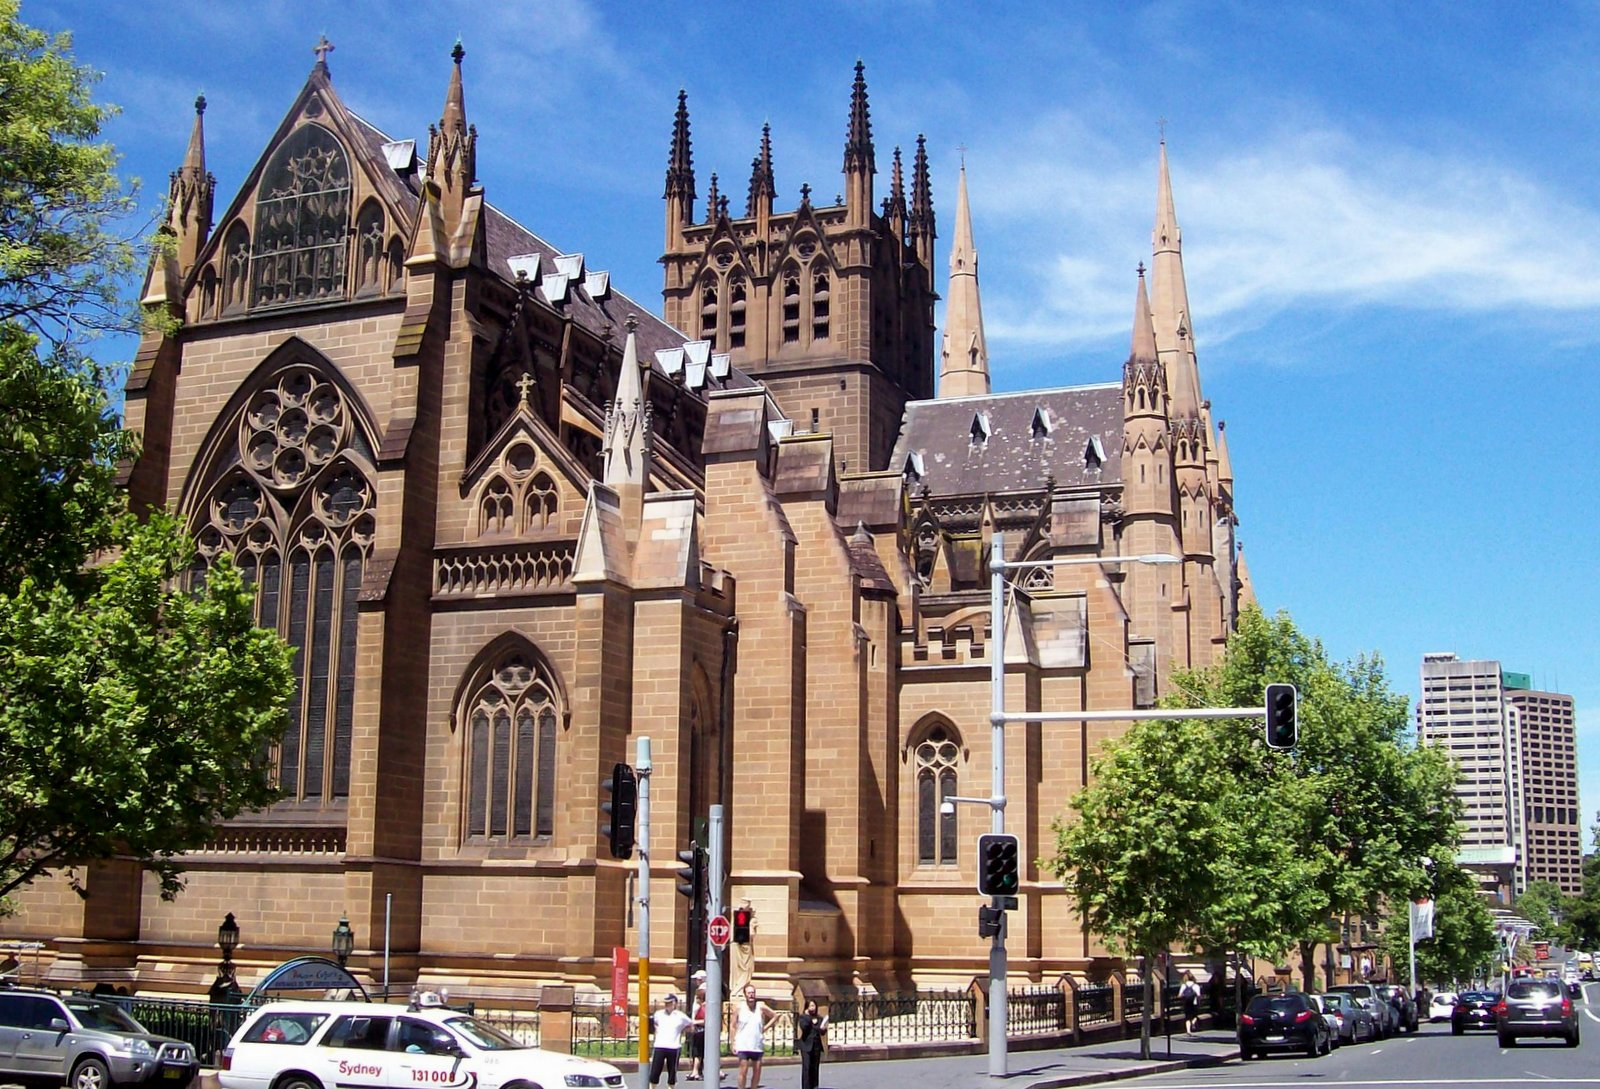 St. Marys Cathedral Sydney